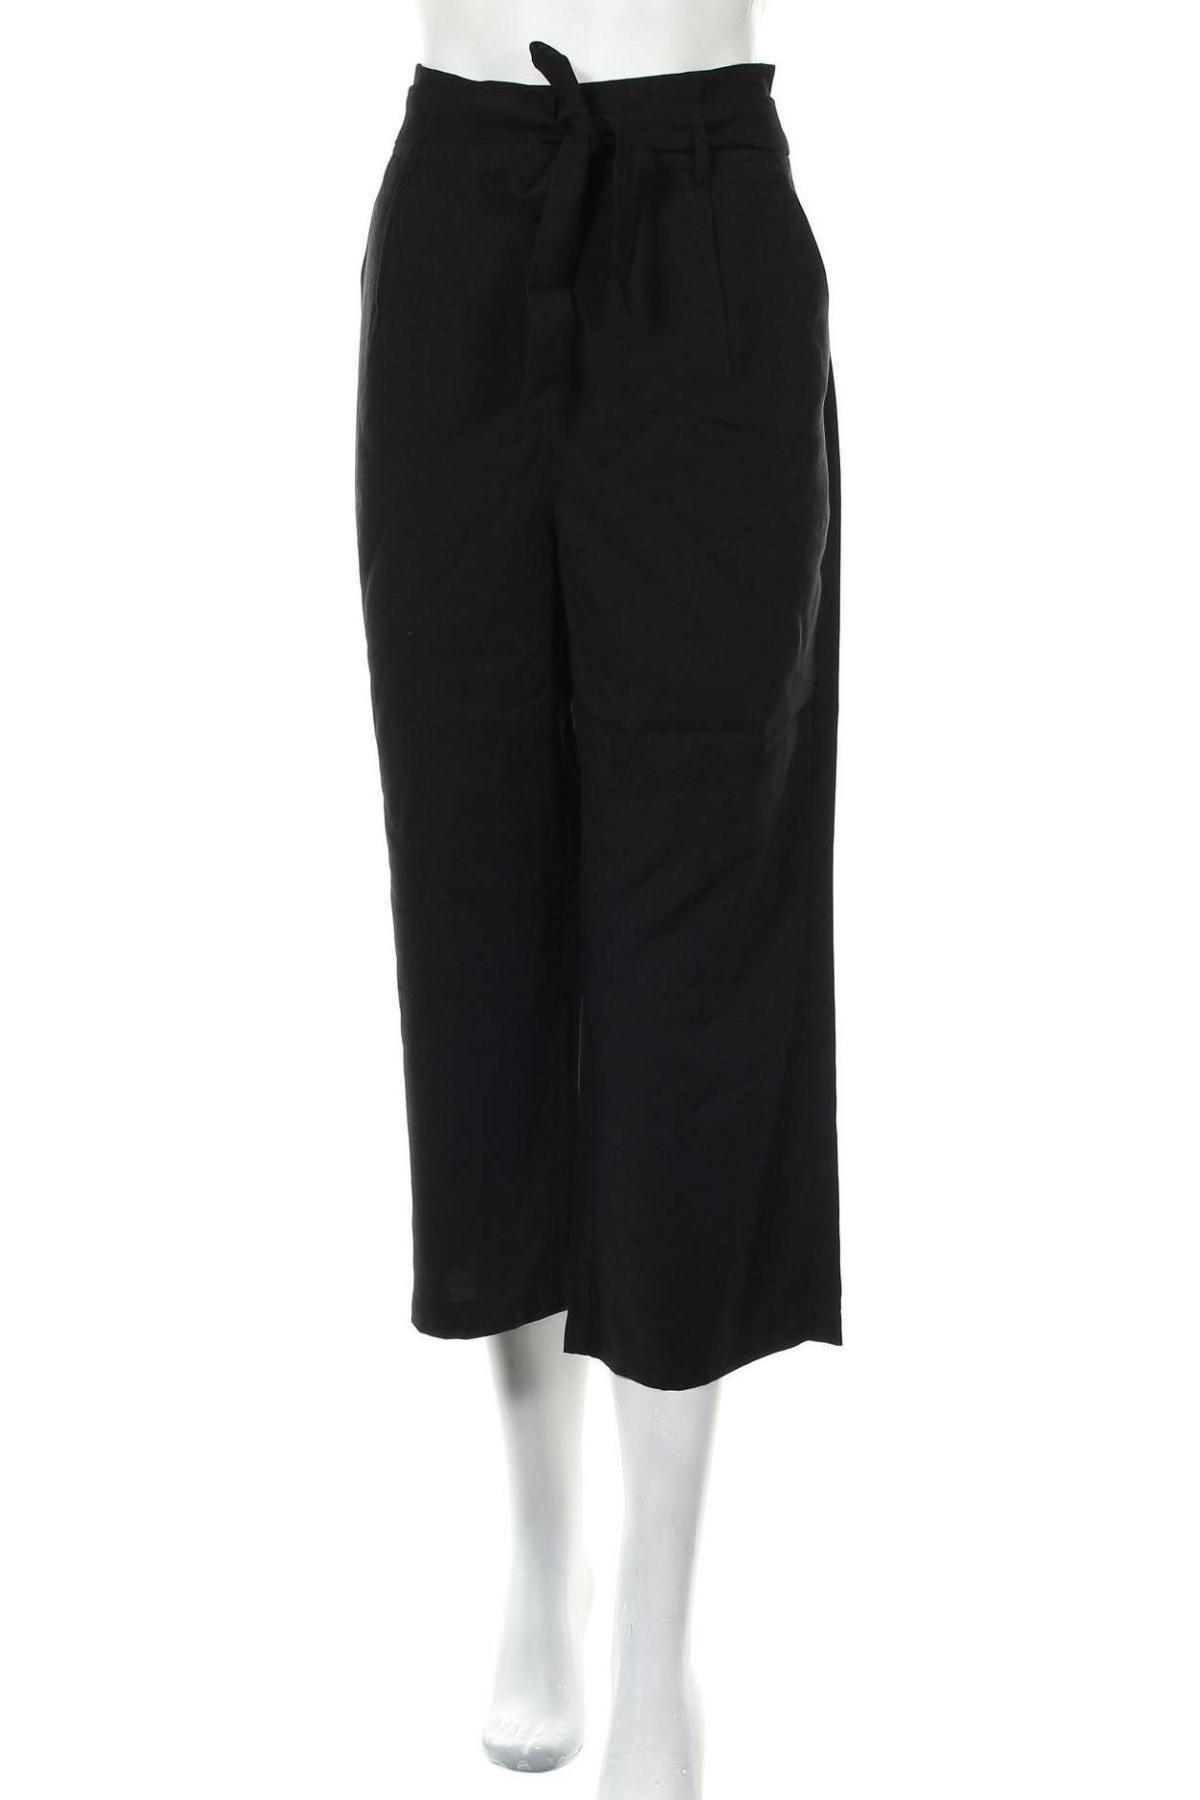 Дамски панталон Vero Moda, Размер M, Цвят Черен, 93% вискоза, 7% полиестер, Цена 19,47лв.